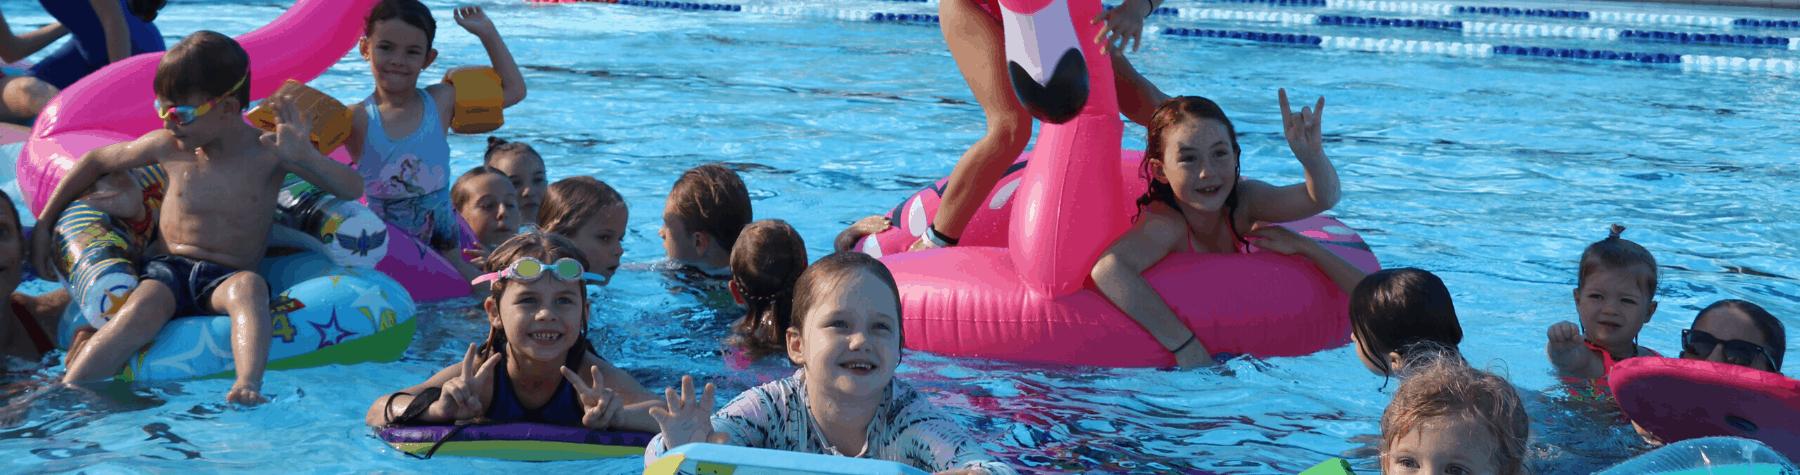 Pool cinema hits Mossman for School Holidays